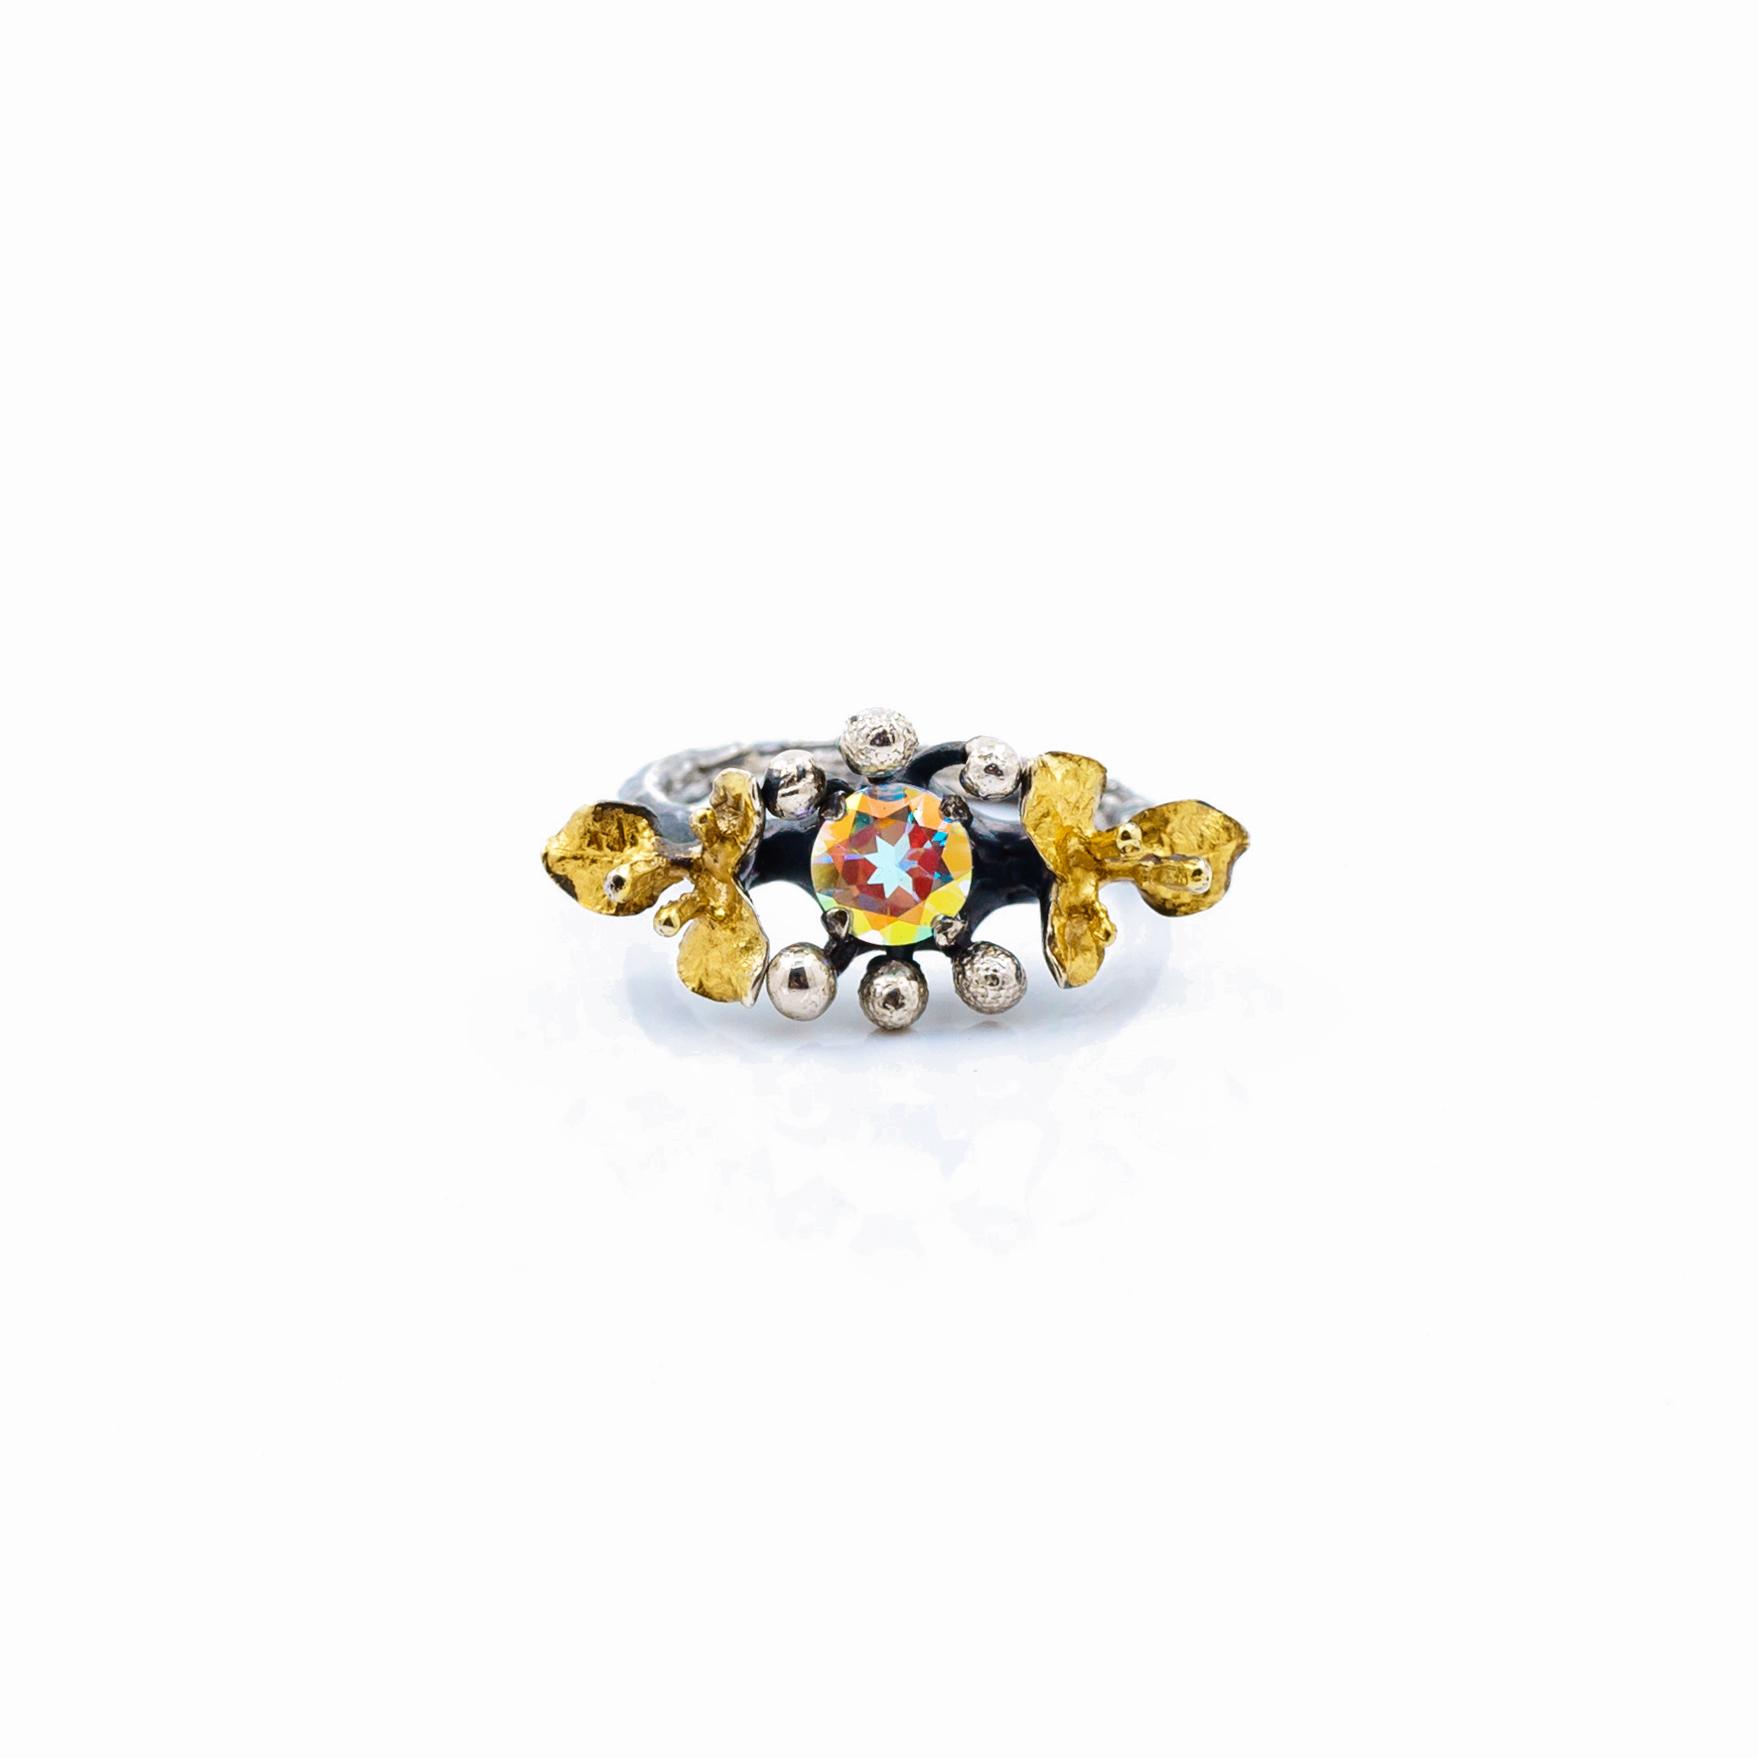 Dark November Ring |Sterling silver,gold vermeil.